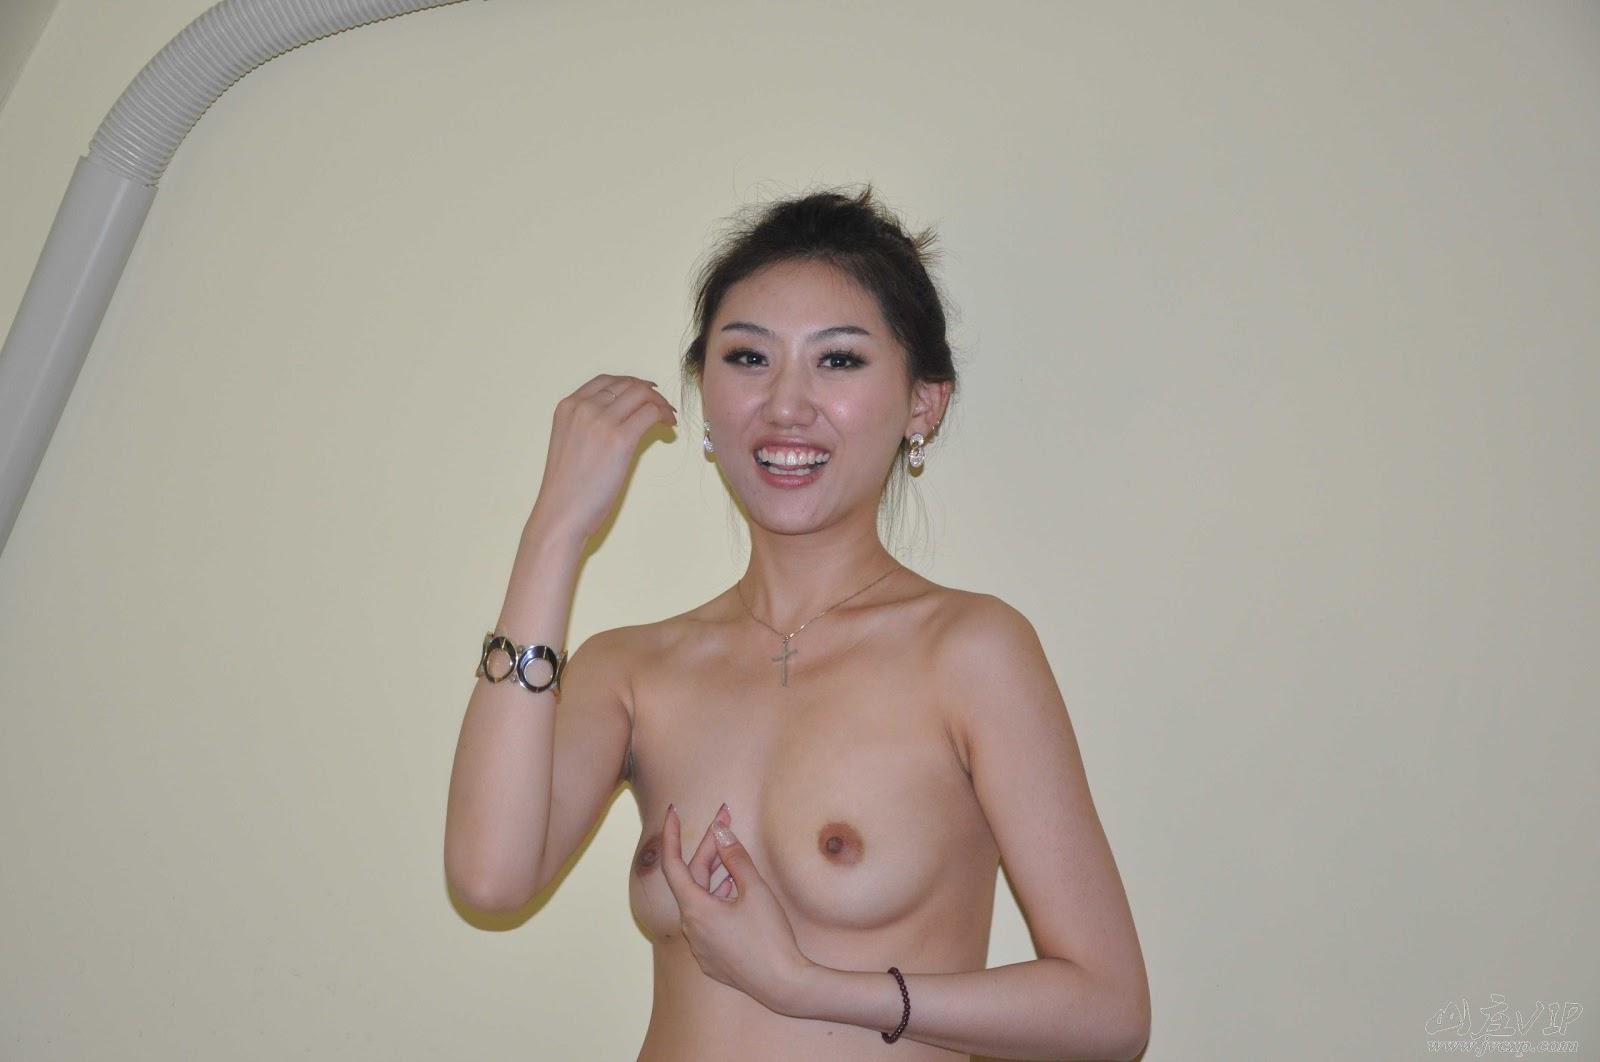 World Supermodel Contest China Winner Leaked Nude Photos